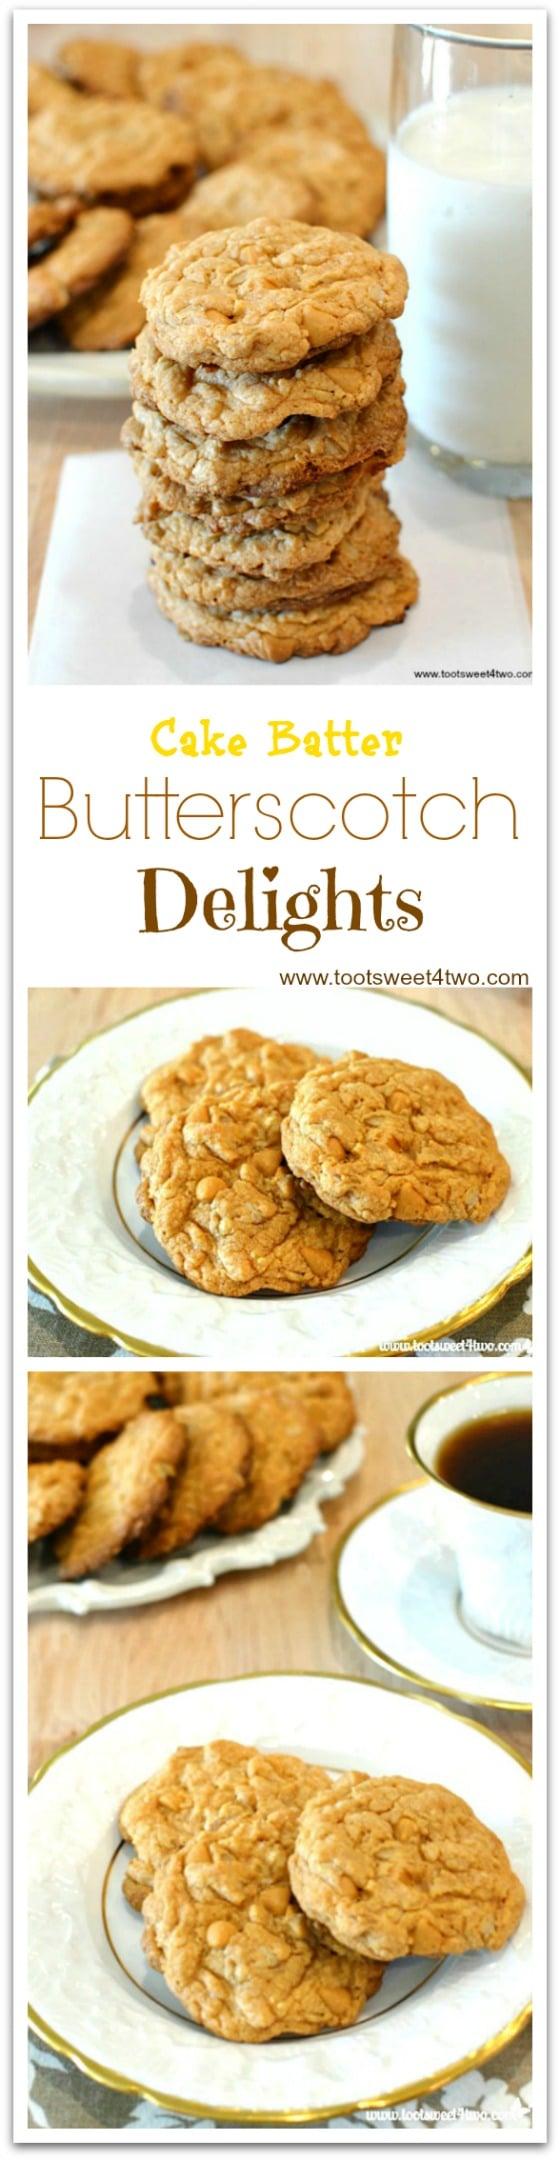 Cake Batter Butterscotch Delights